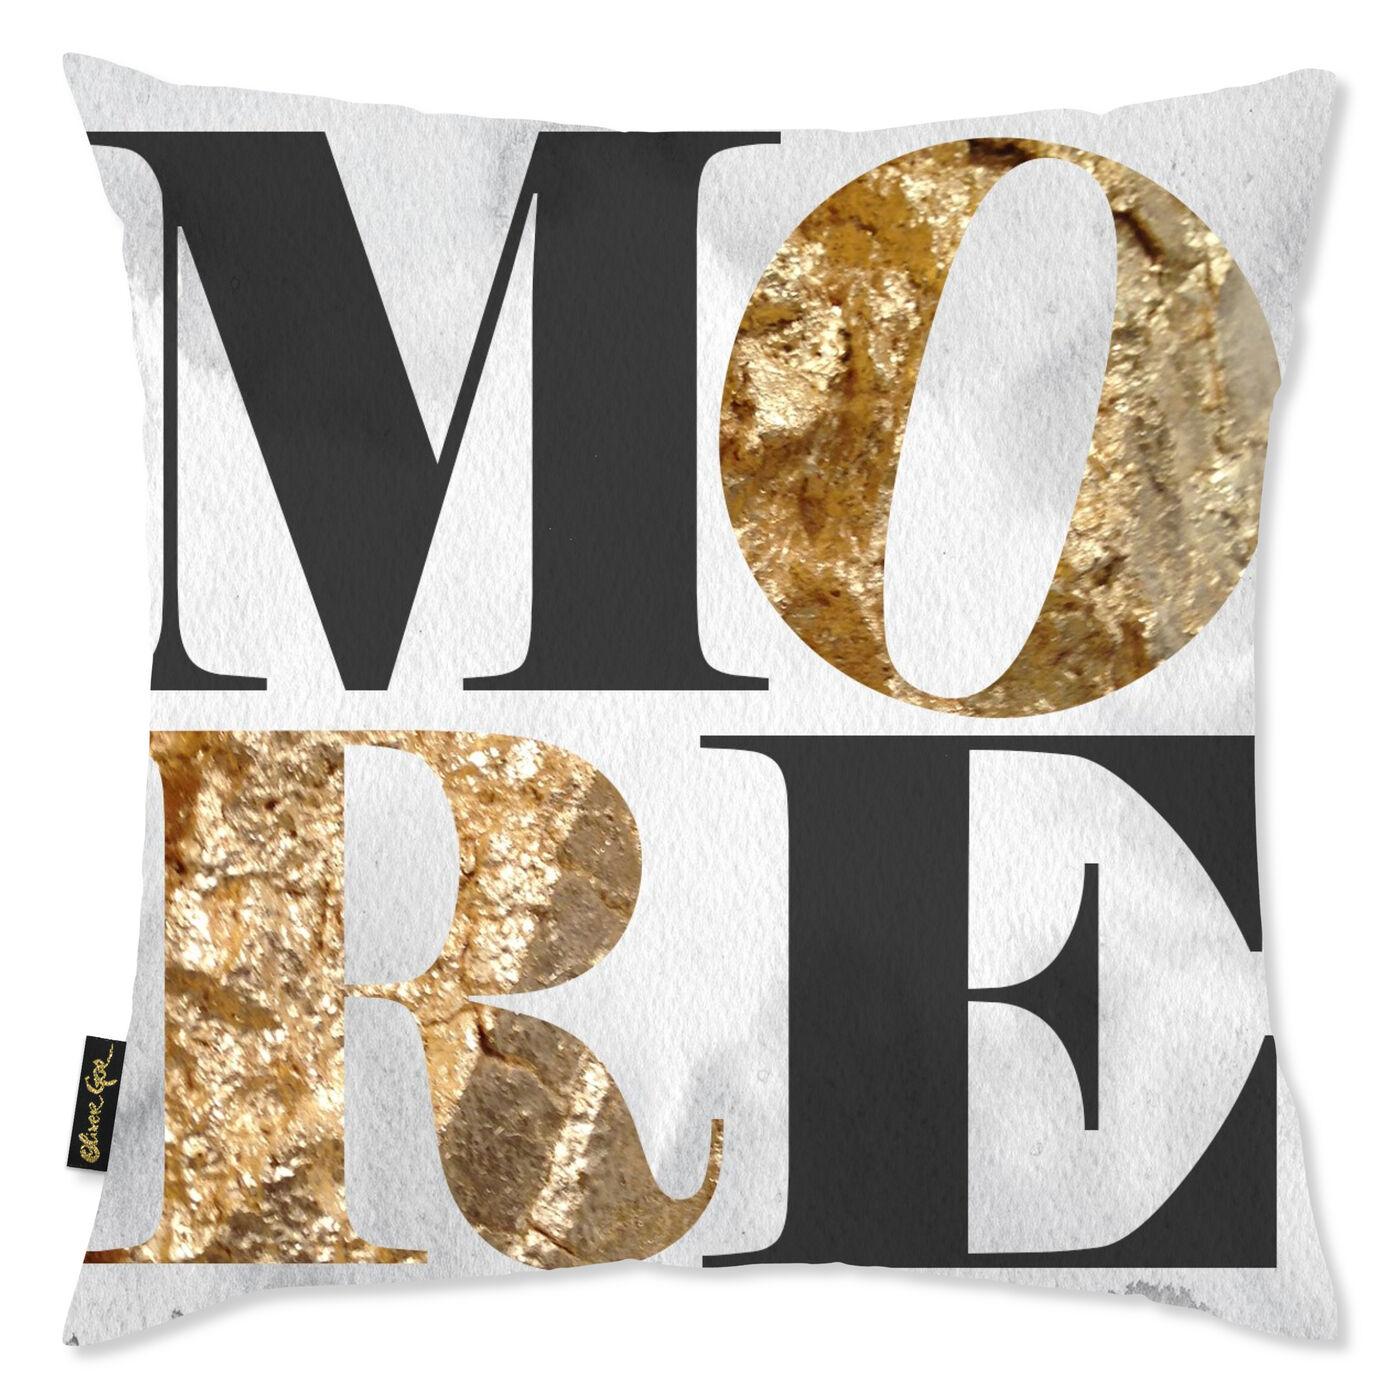 More Love Pillow